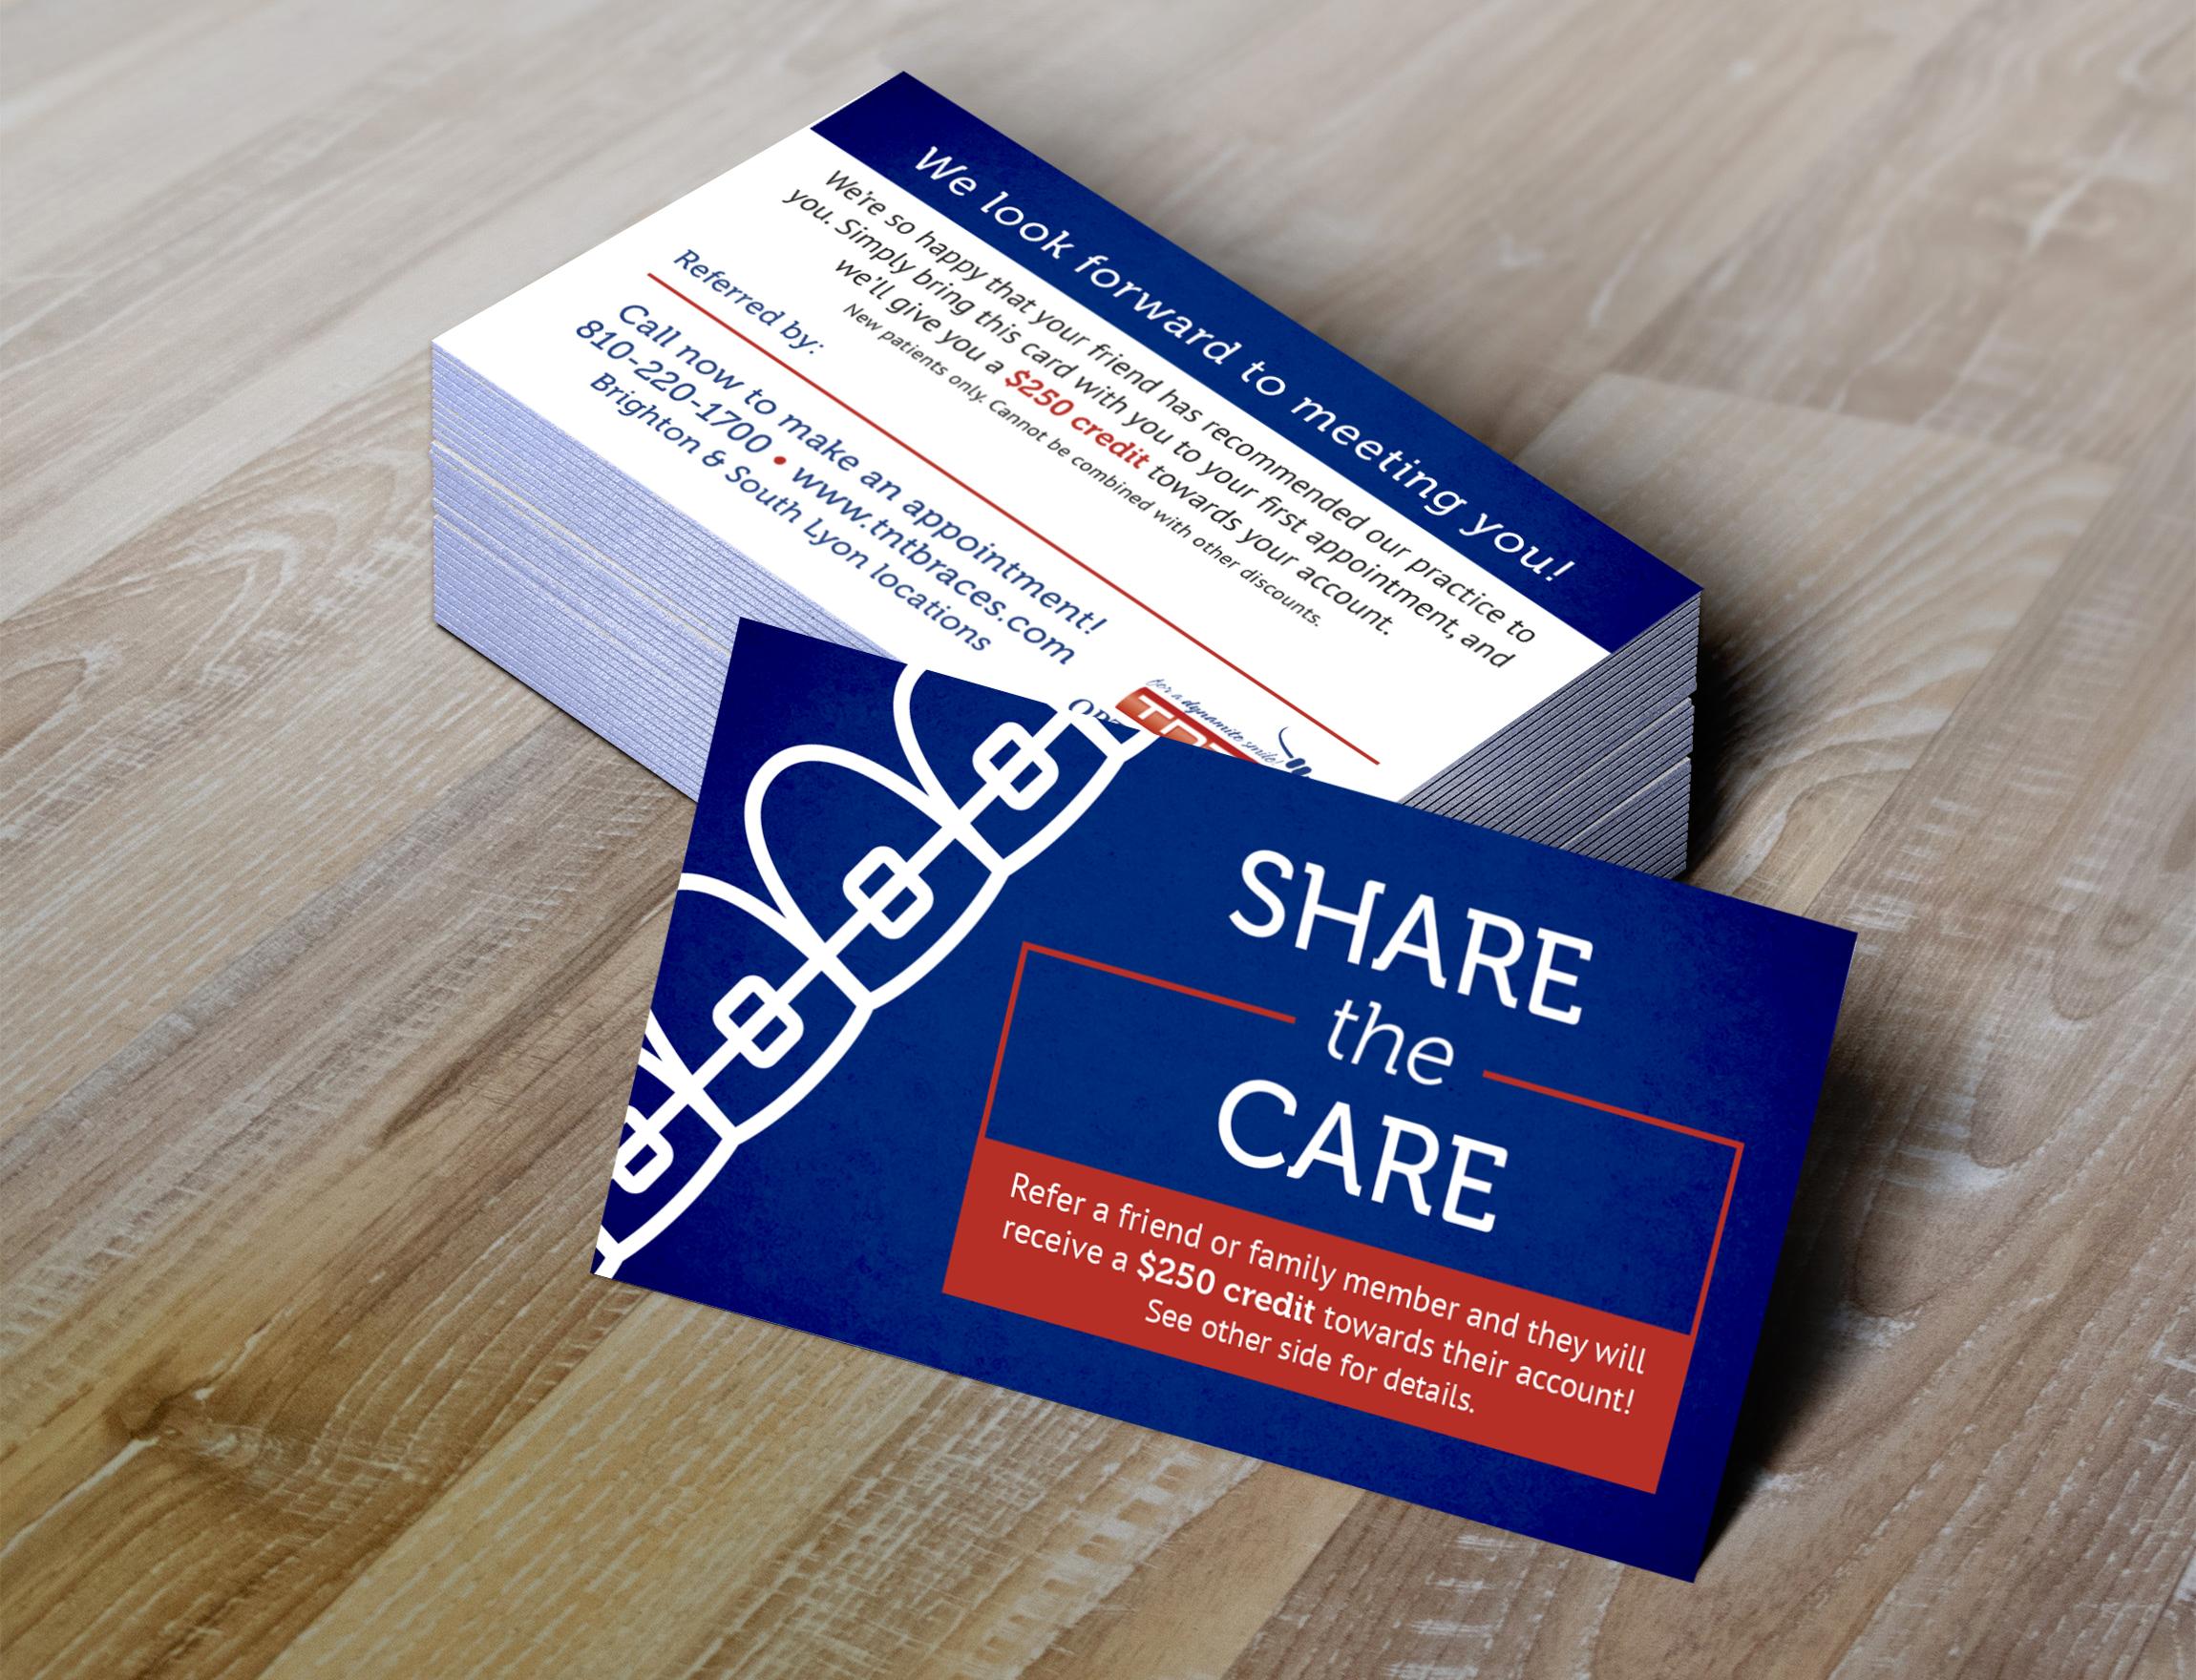 share-the-care.jpg